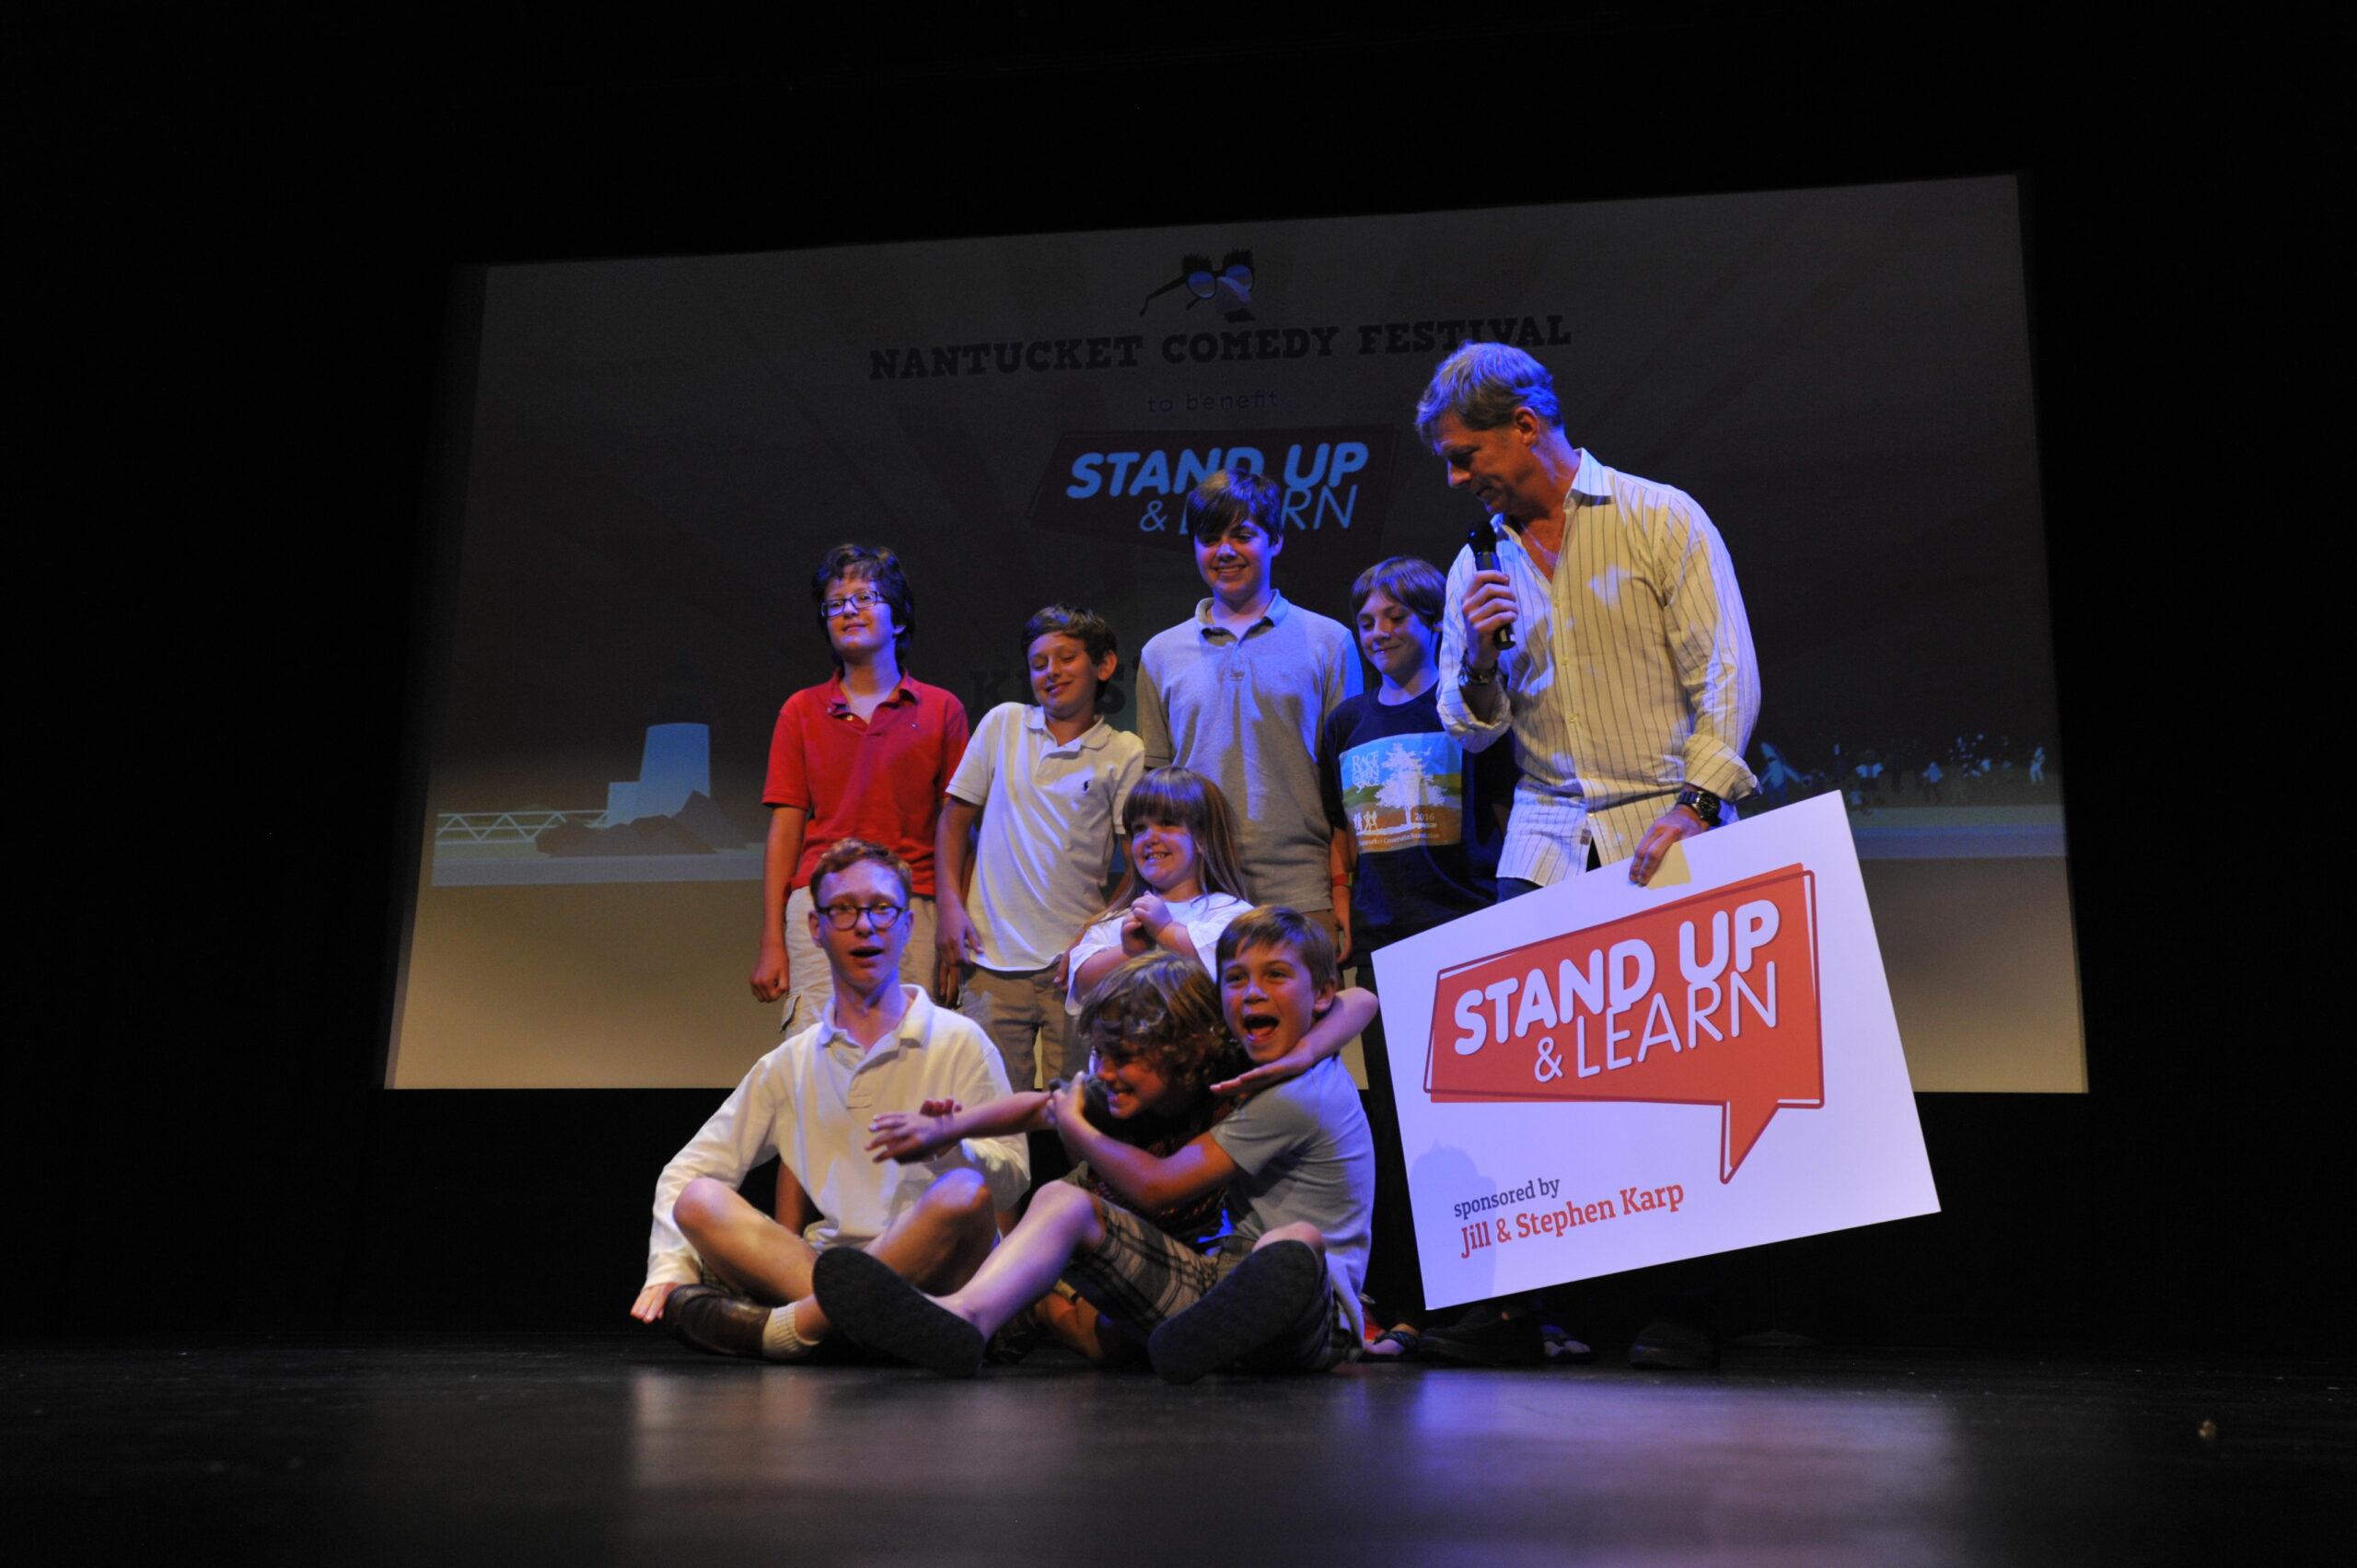 #OpenForGood Profile: Nantucket Comedy Festival